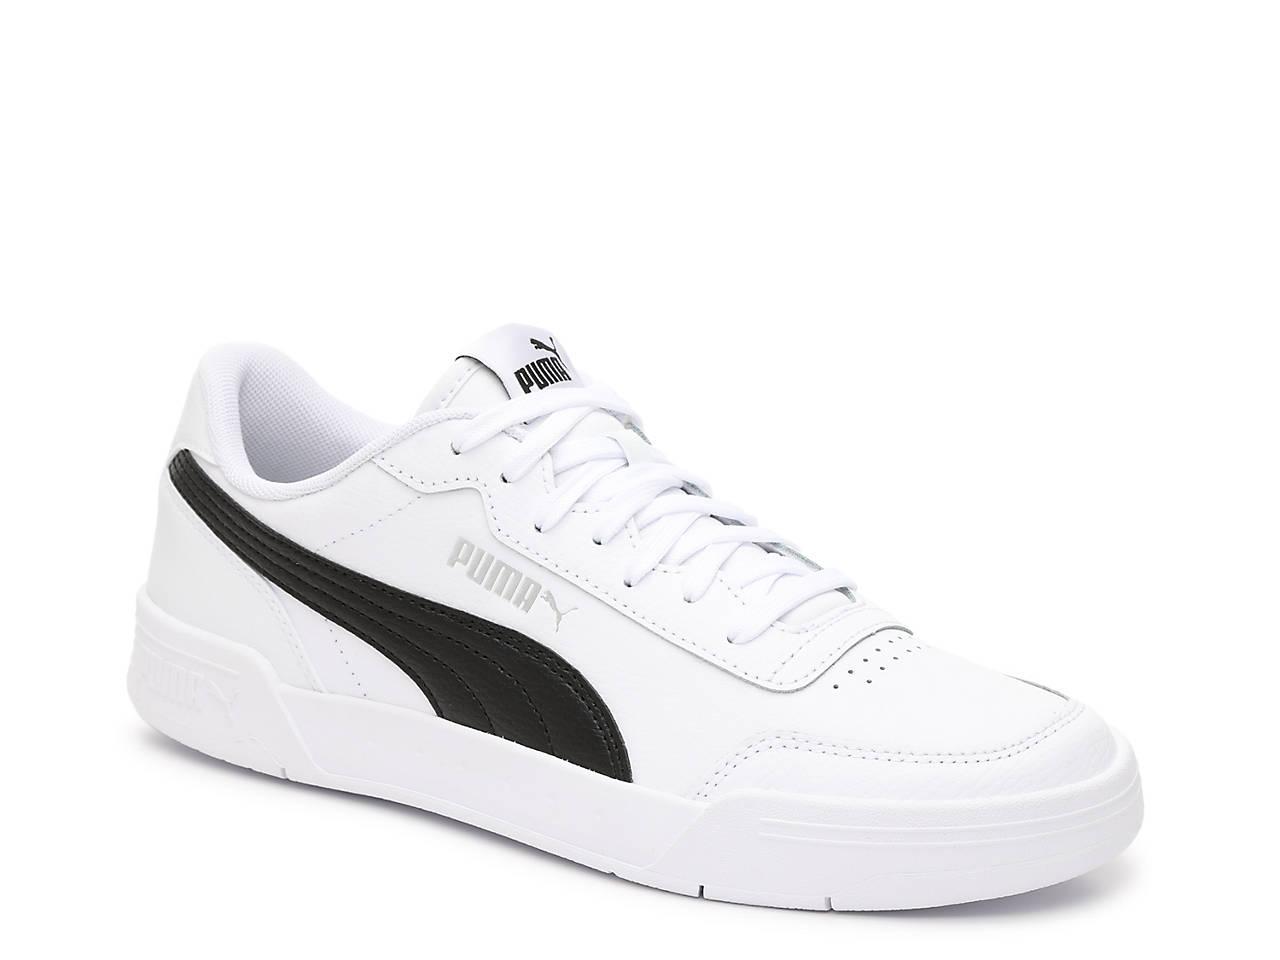 Puma Caracal Sneaker Men's Men's Shoes | DSW